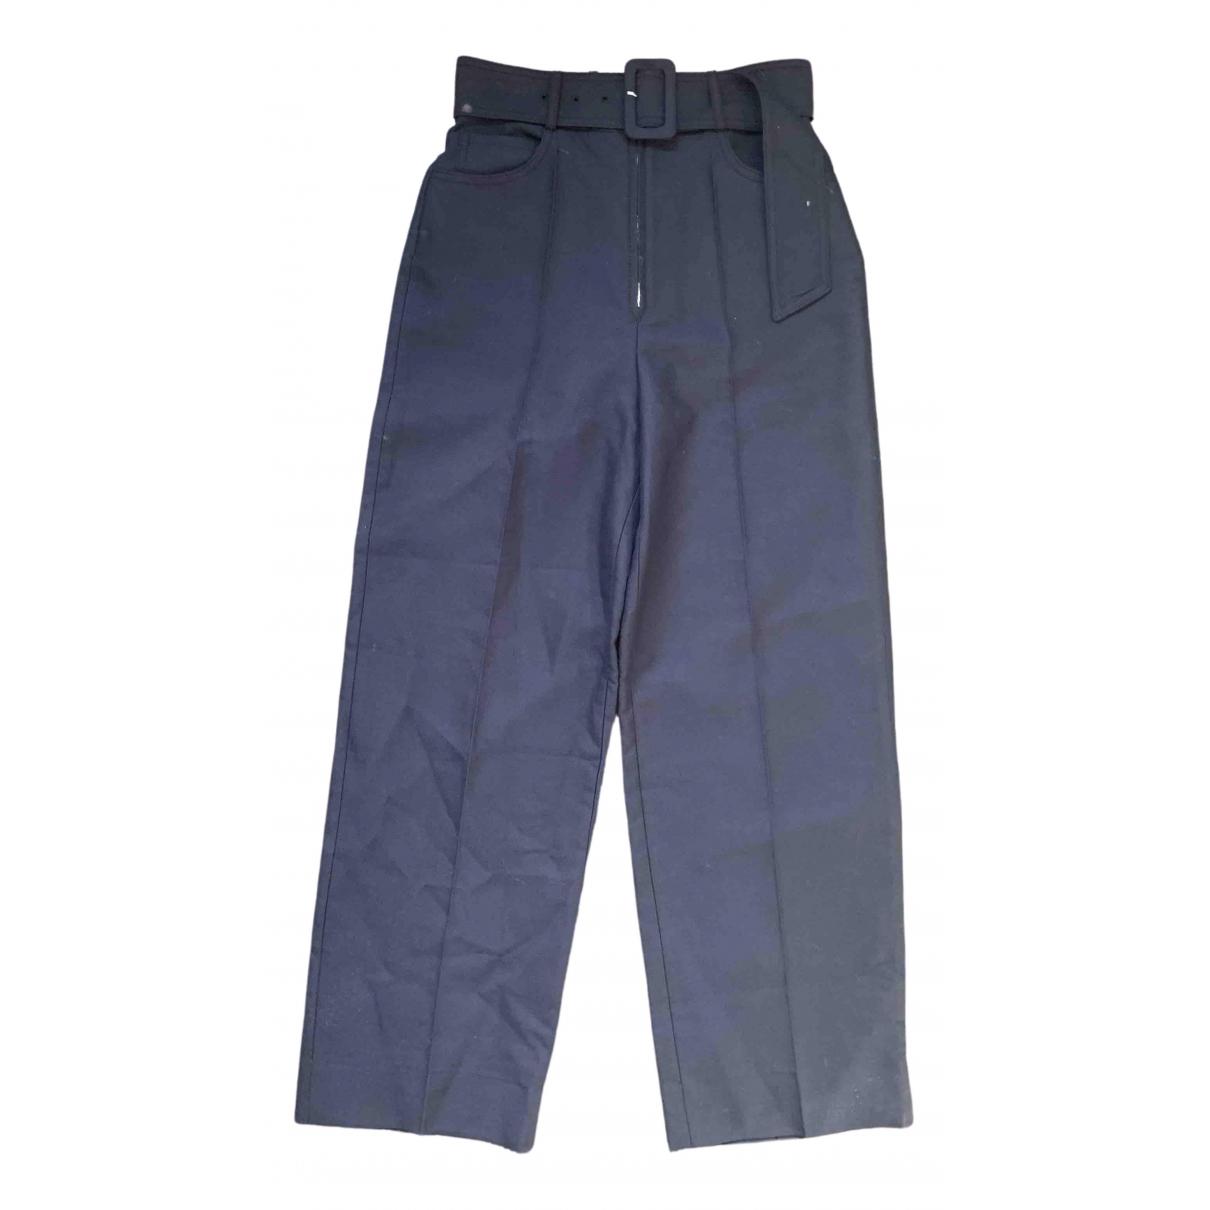 Sandro Spring Summer 2019 Blue Cotton Trousers for Women 36 FR